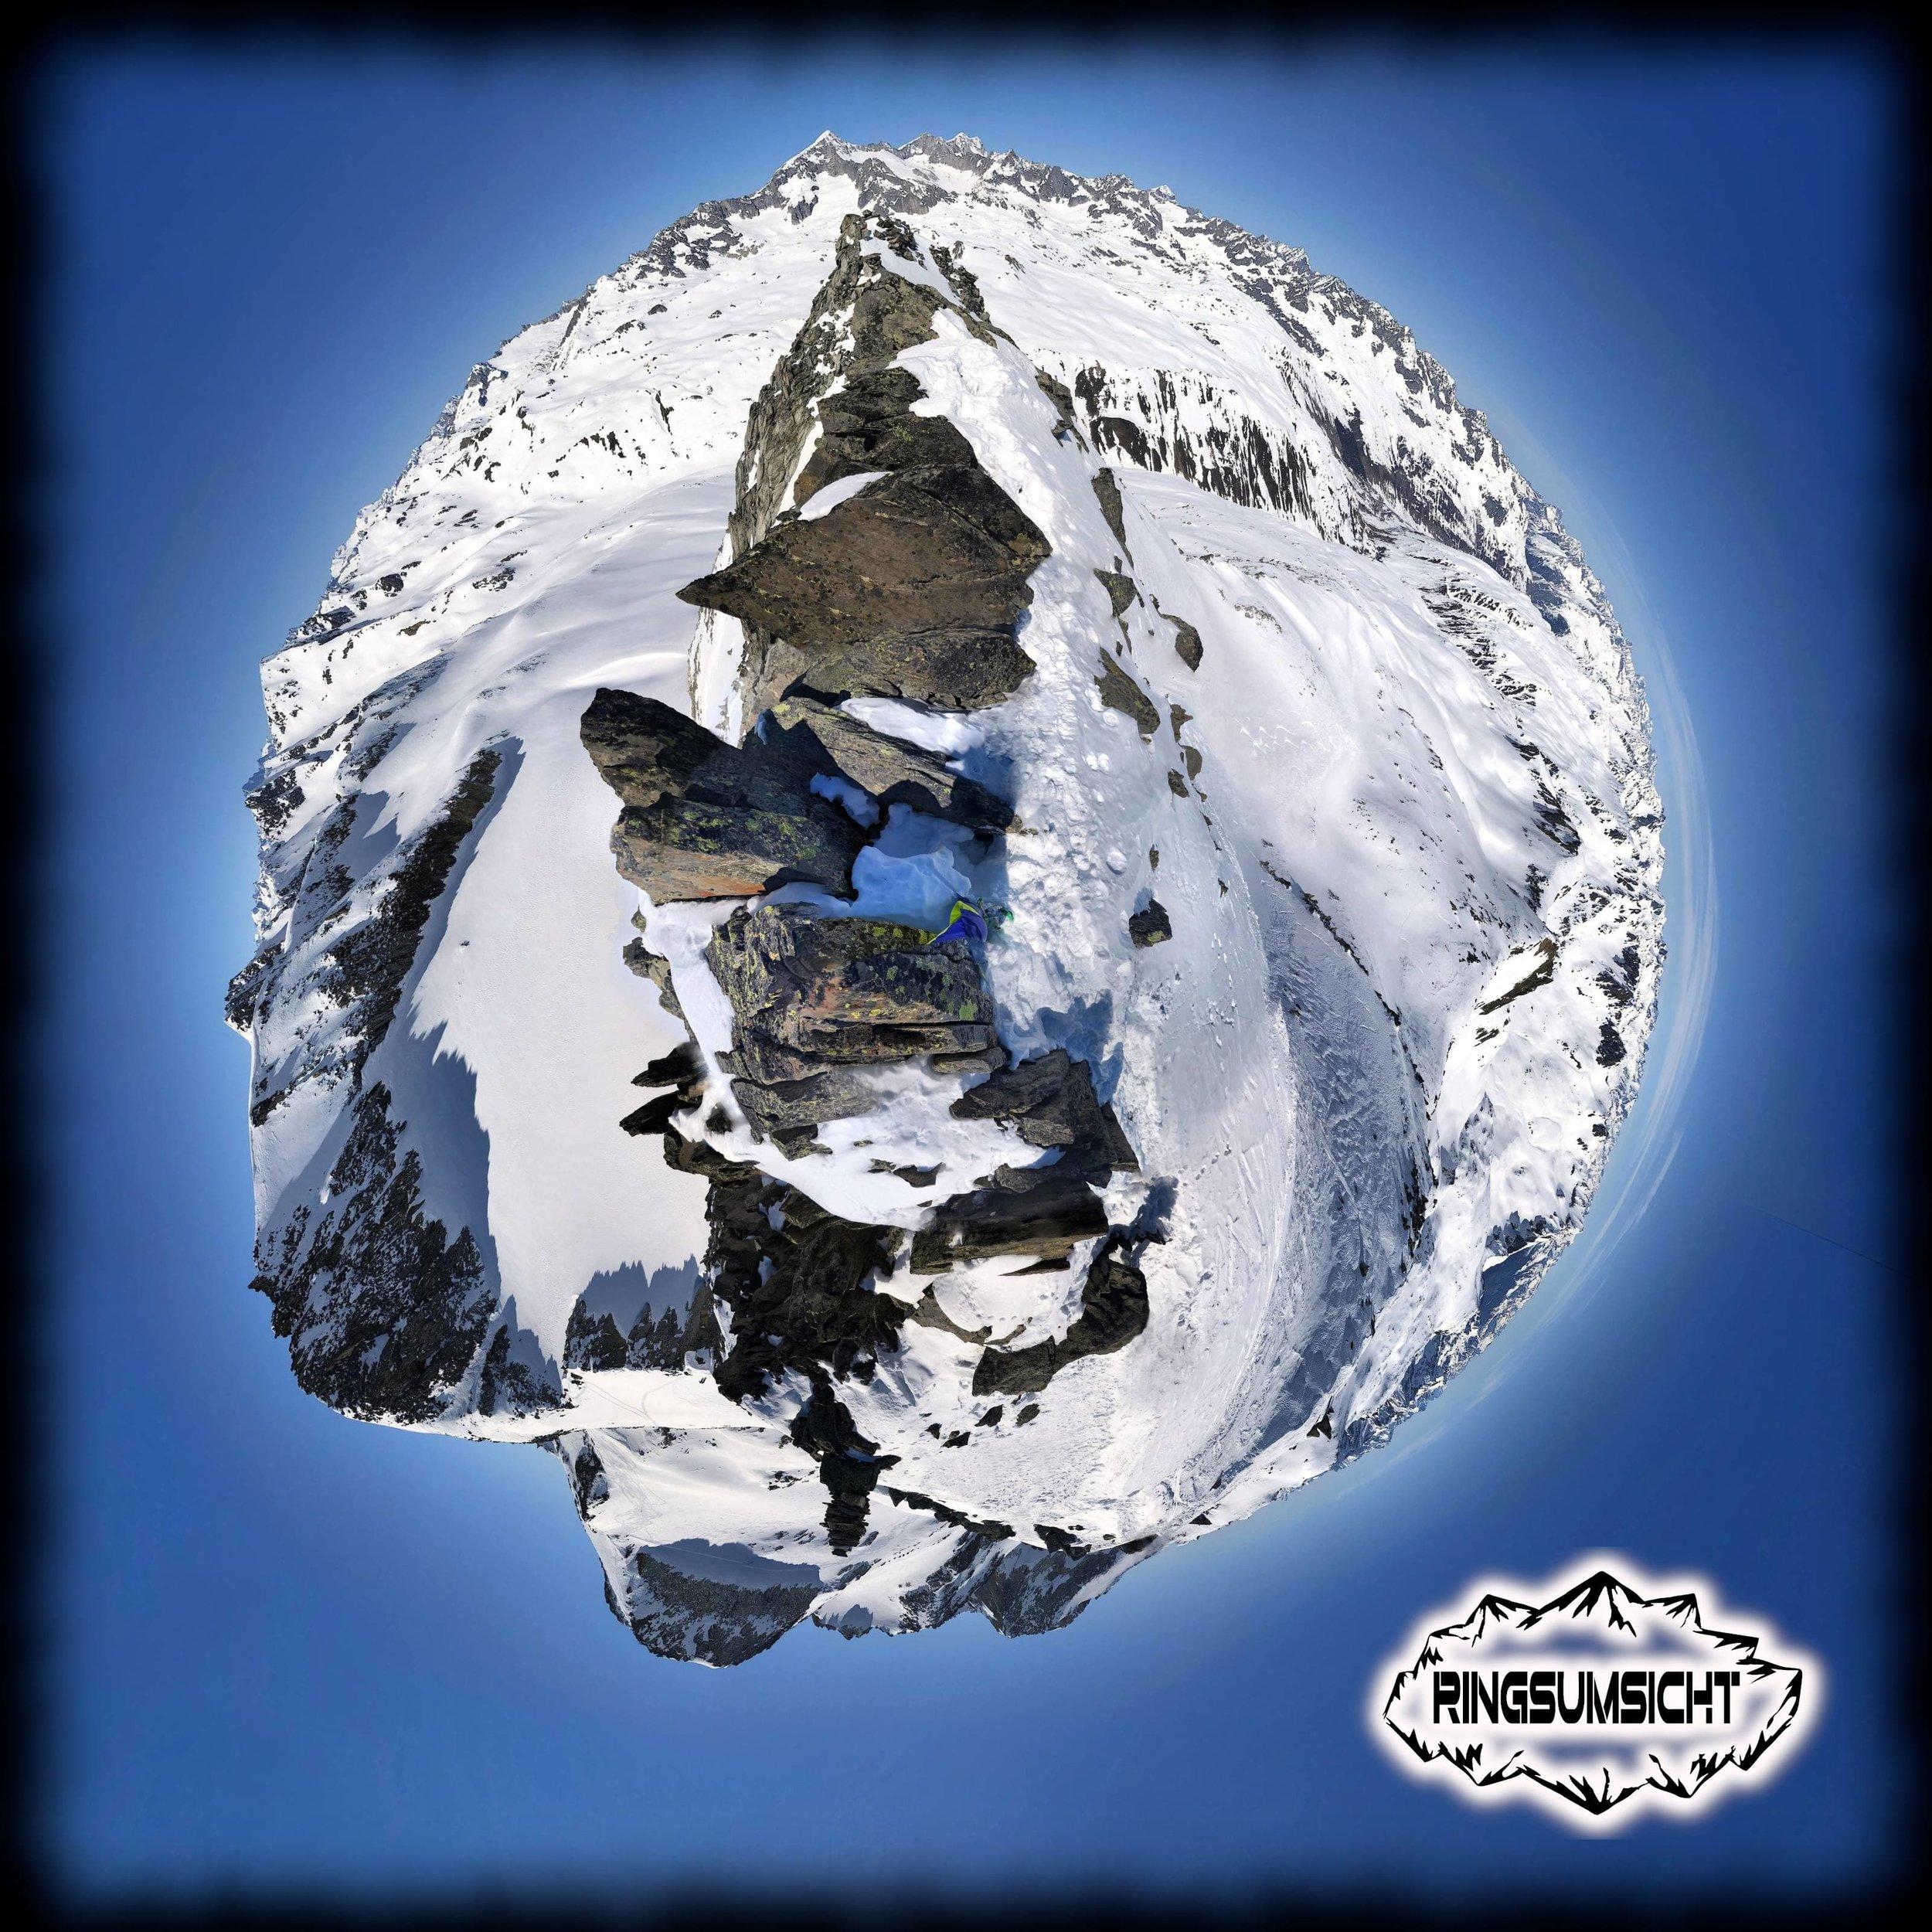 Rottällihorn 360° Gipfelpanorama